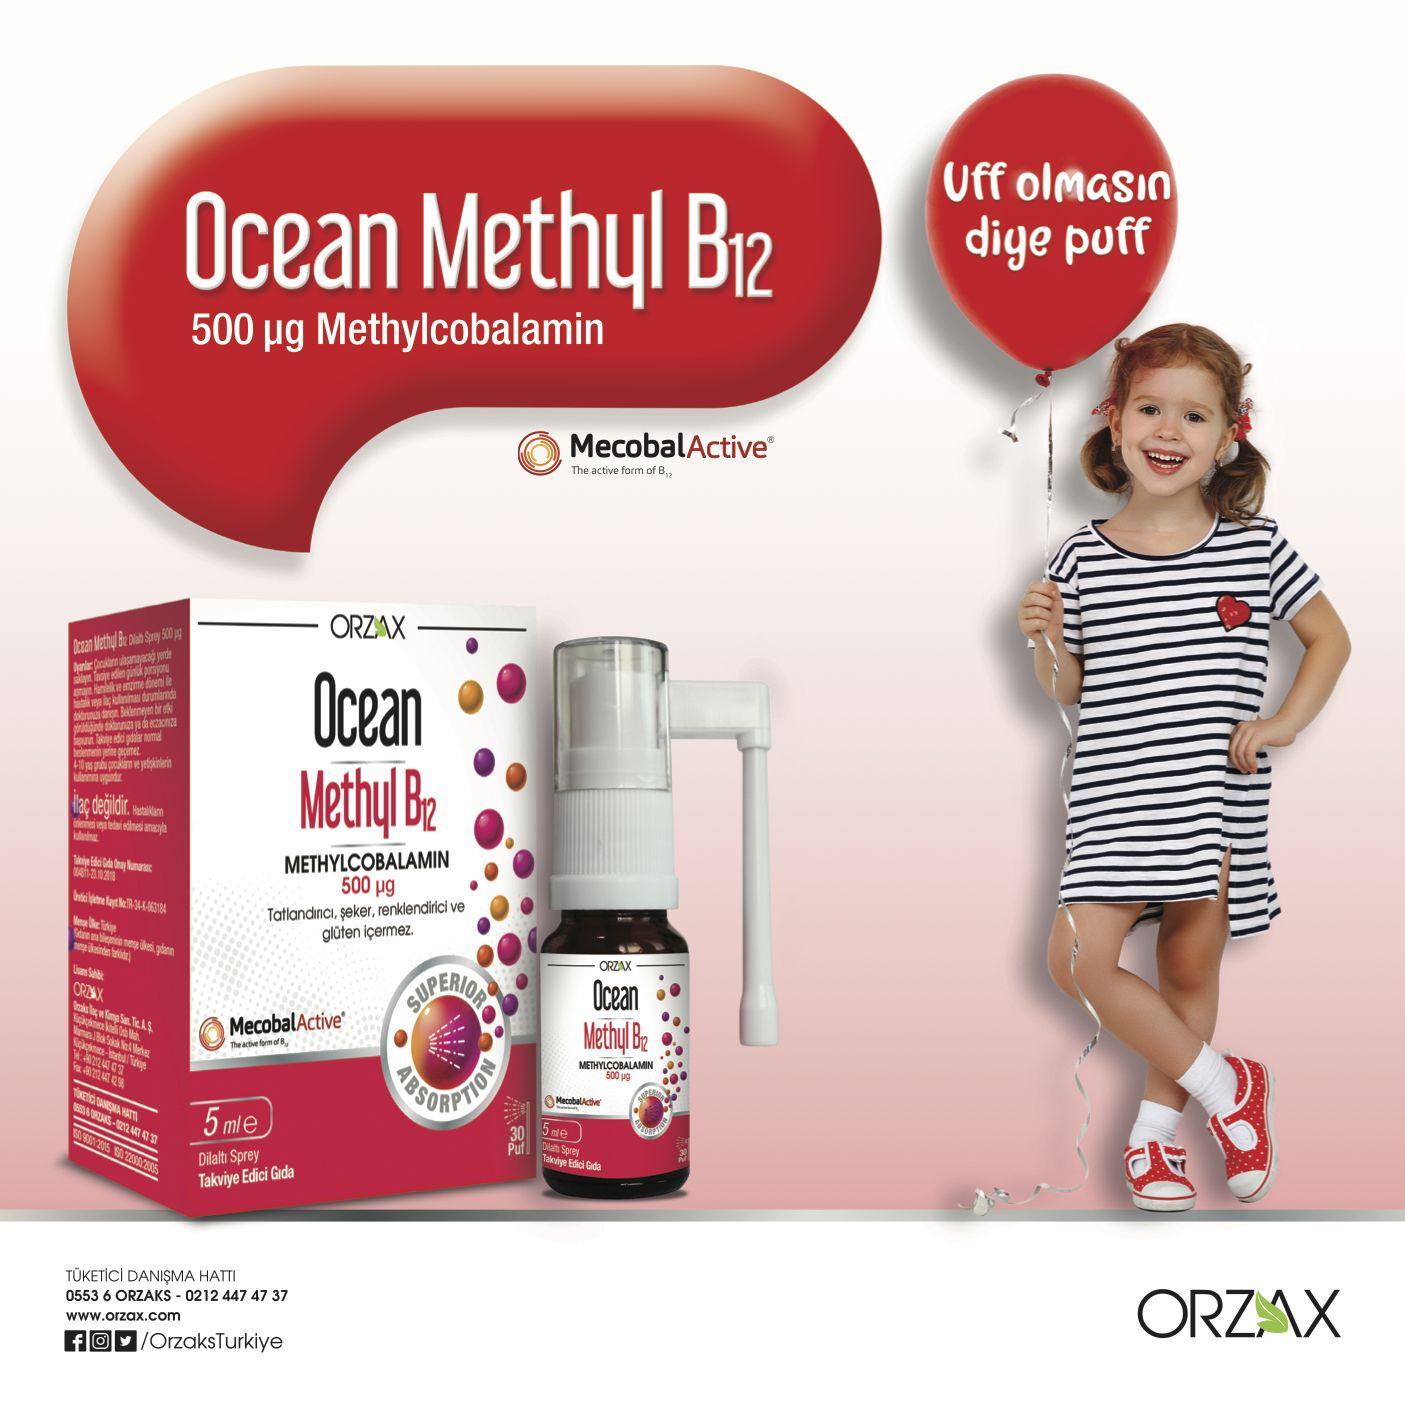 Ocean Methyl B12 Aktif Formda B12 Vitamini Icerir Bu Sayede Vucut Tarafindan Direkt Kullanilabilir Ocean Methyl B12 Sprey Basli Instagram Turkiye Urunler